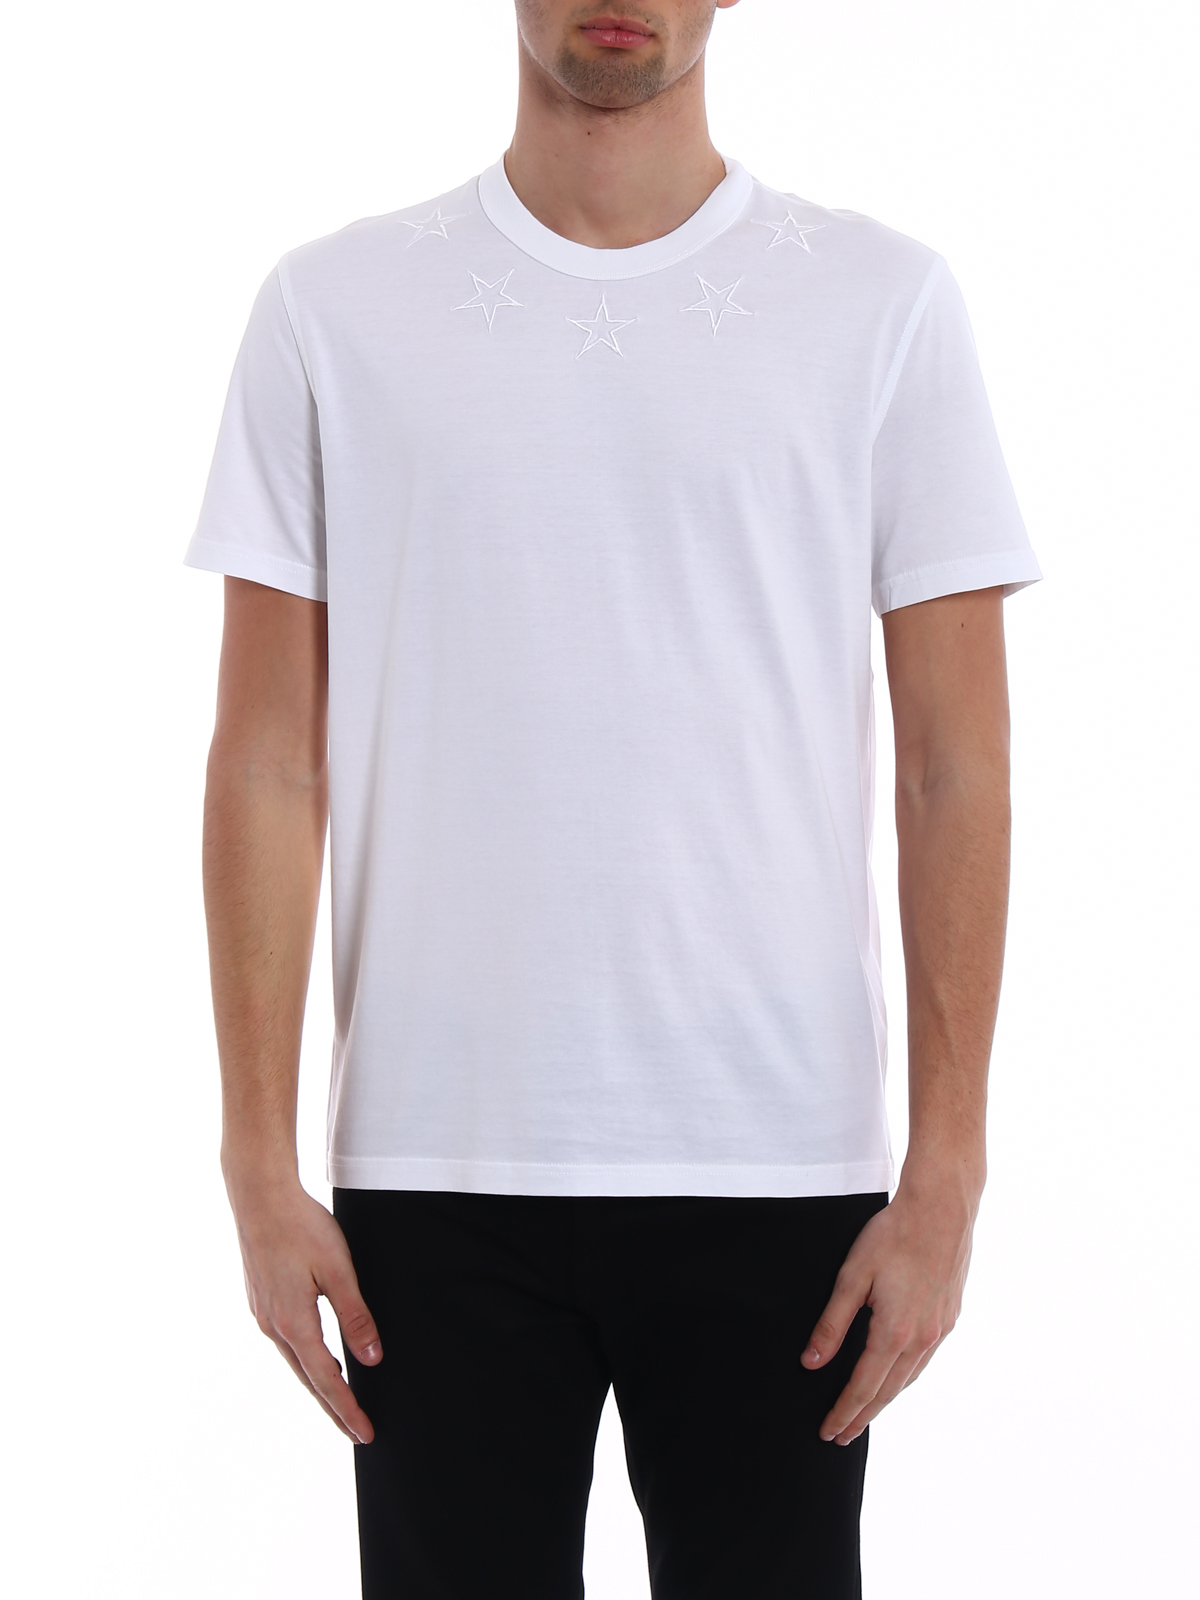 b69cf6c0dfd Givenchy - Embroidered stars white T-shirt - t-shirts - BM70703Y2W100